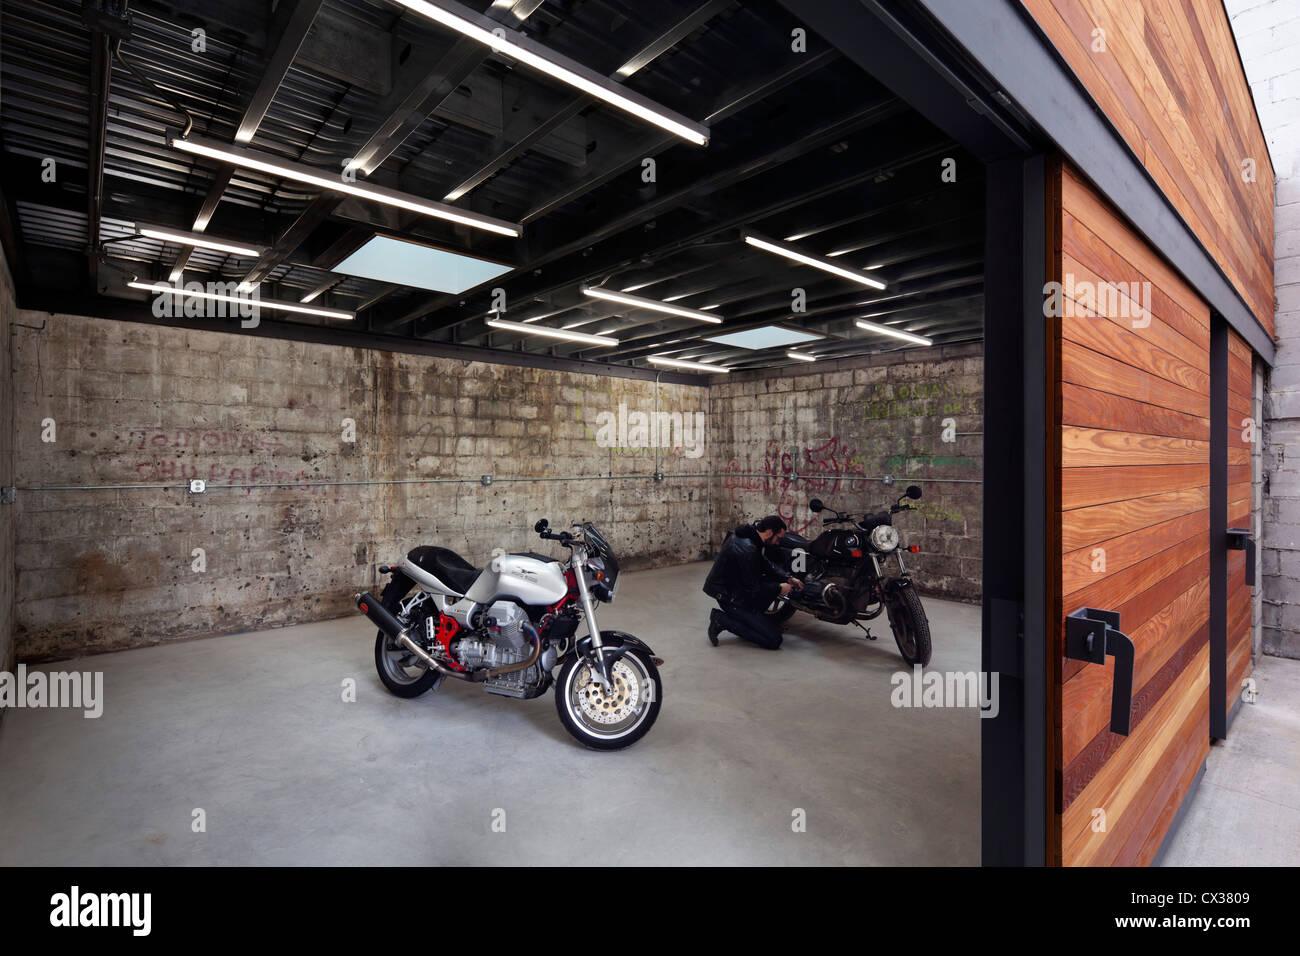 Bushwick Motorcycle Garage And Garden Brooklyn United States Stock